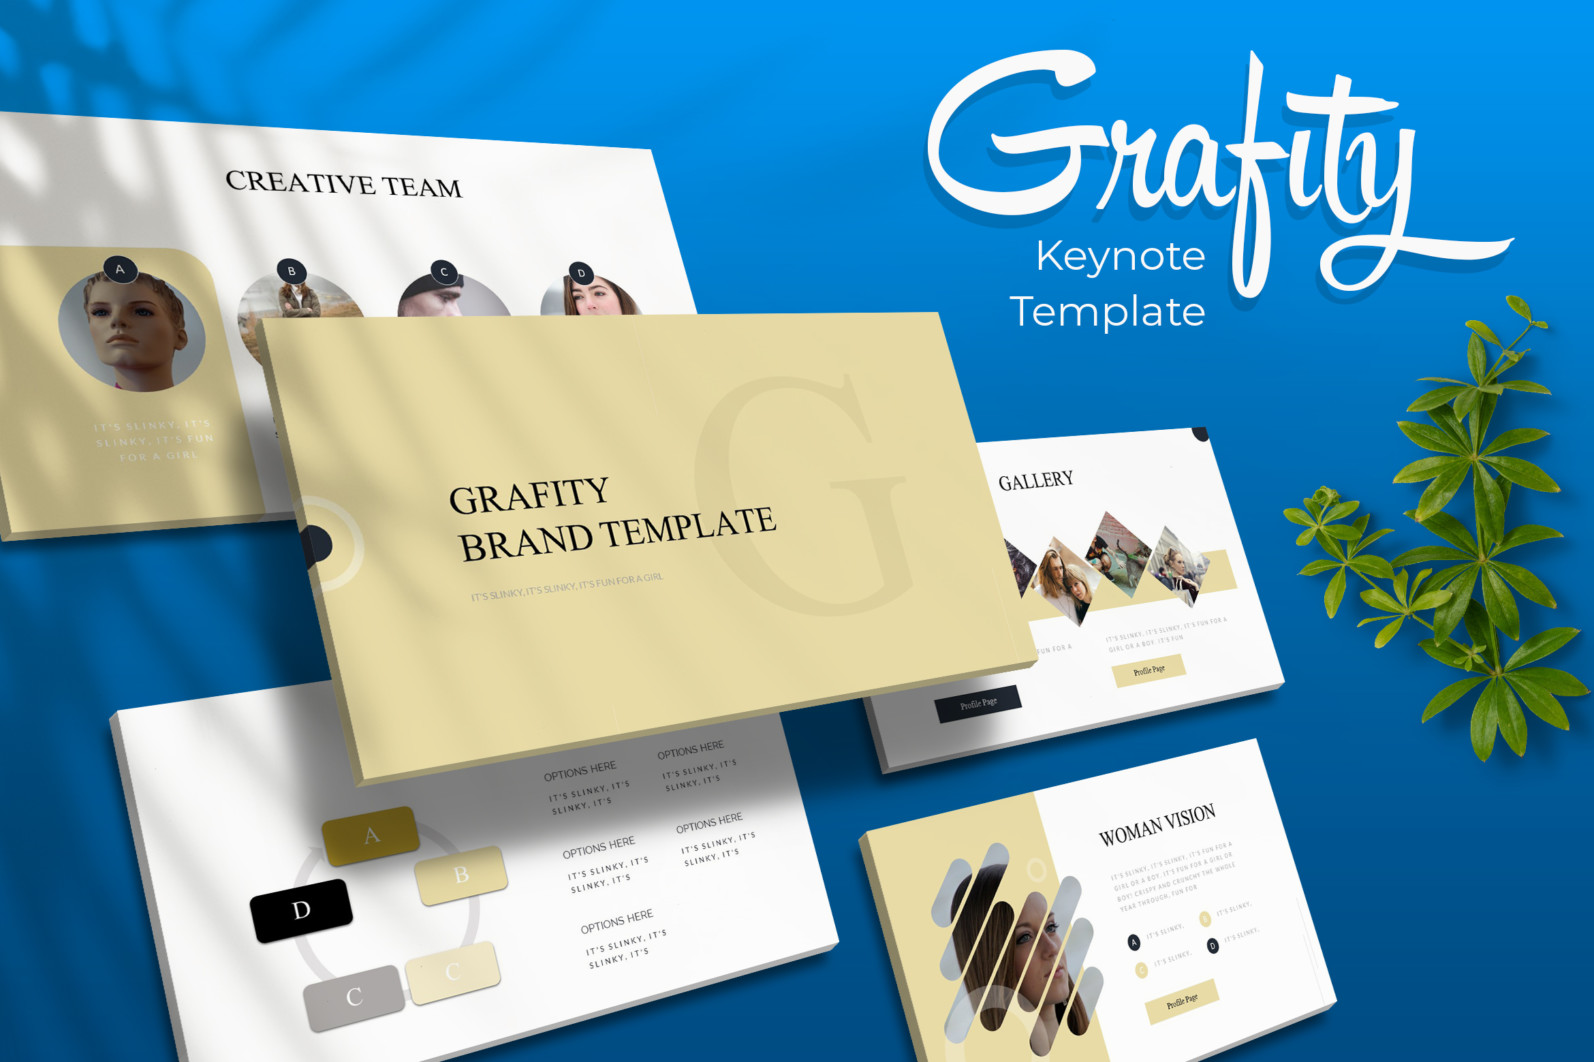 Grafity Keynote Template - Grafity Keynote Template -